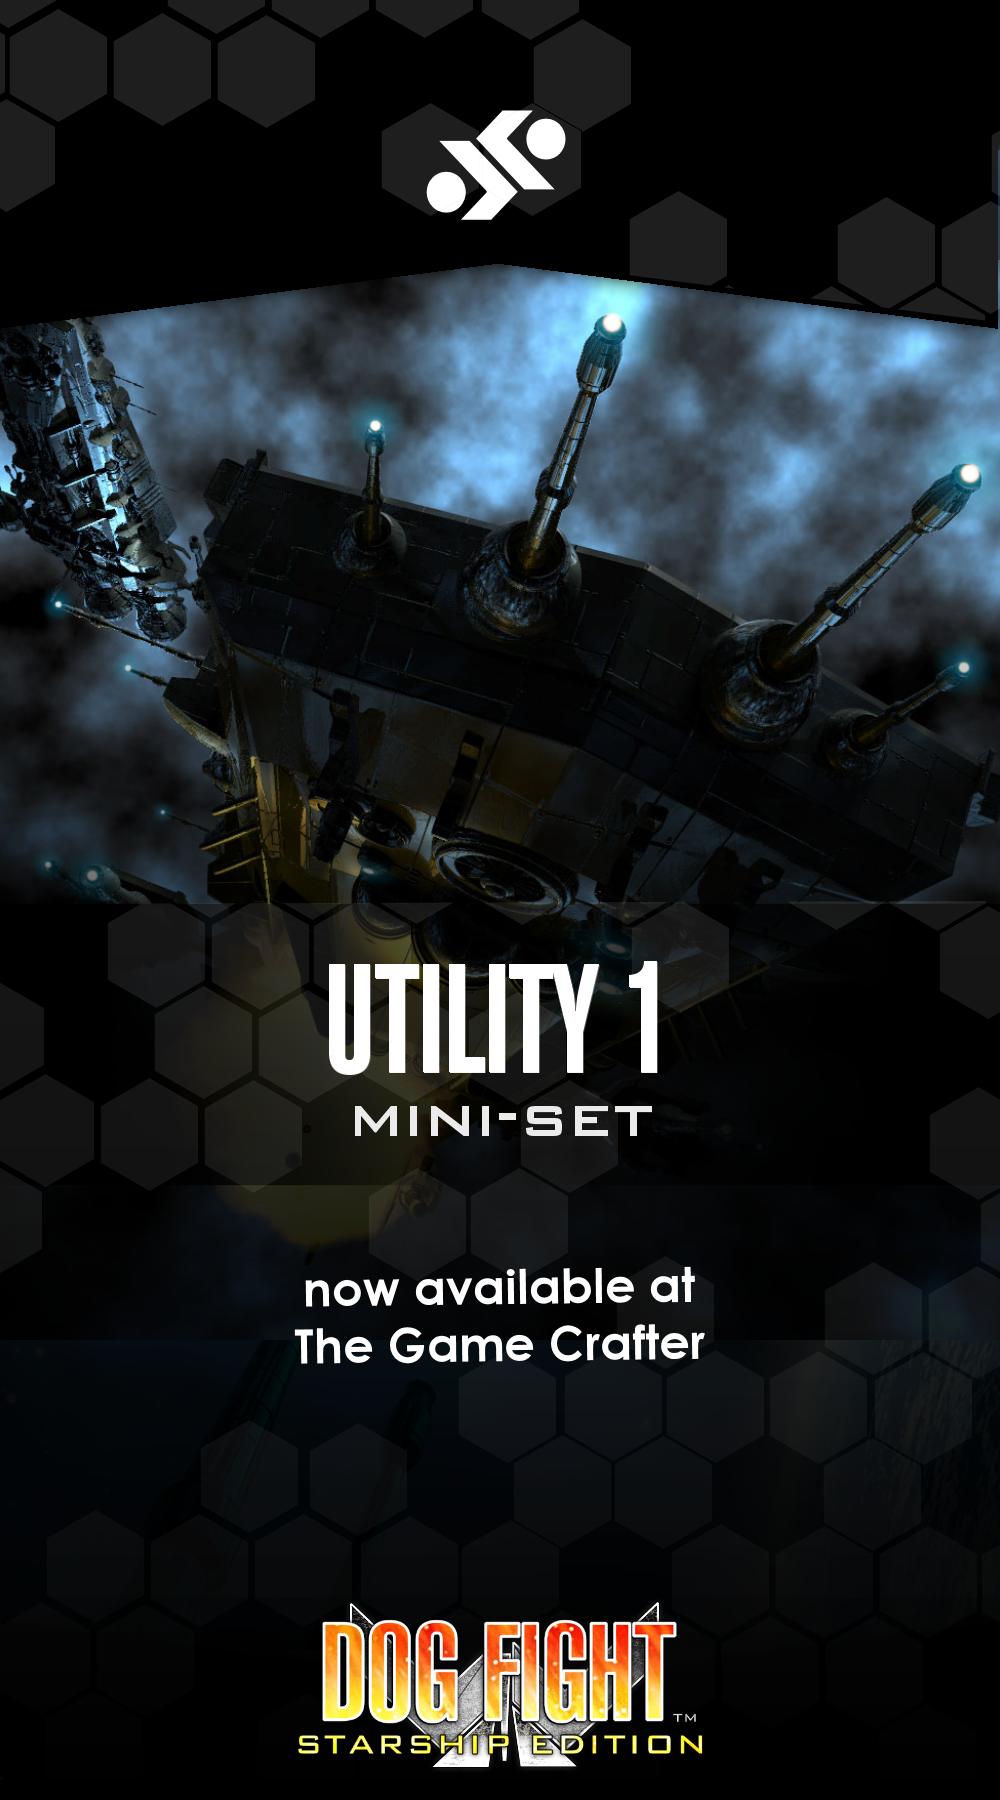 Dog Fight: Starship Edition Utility Mini-set